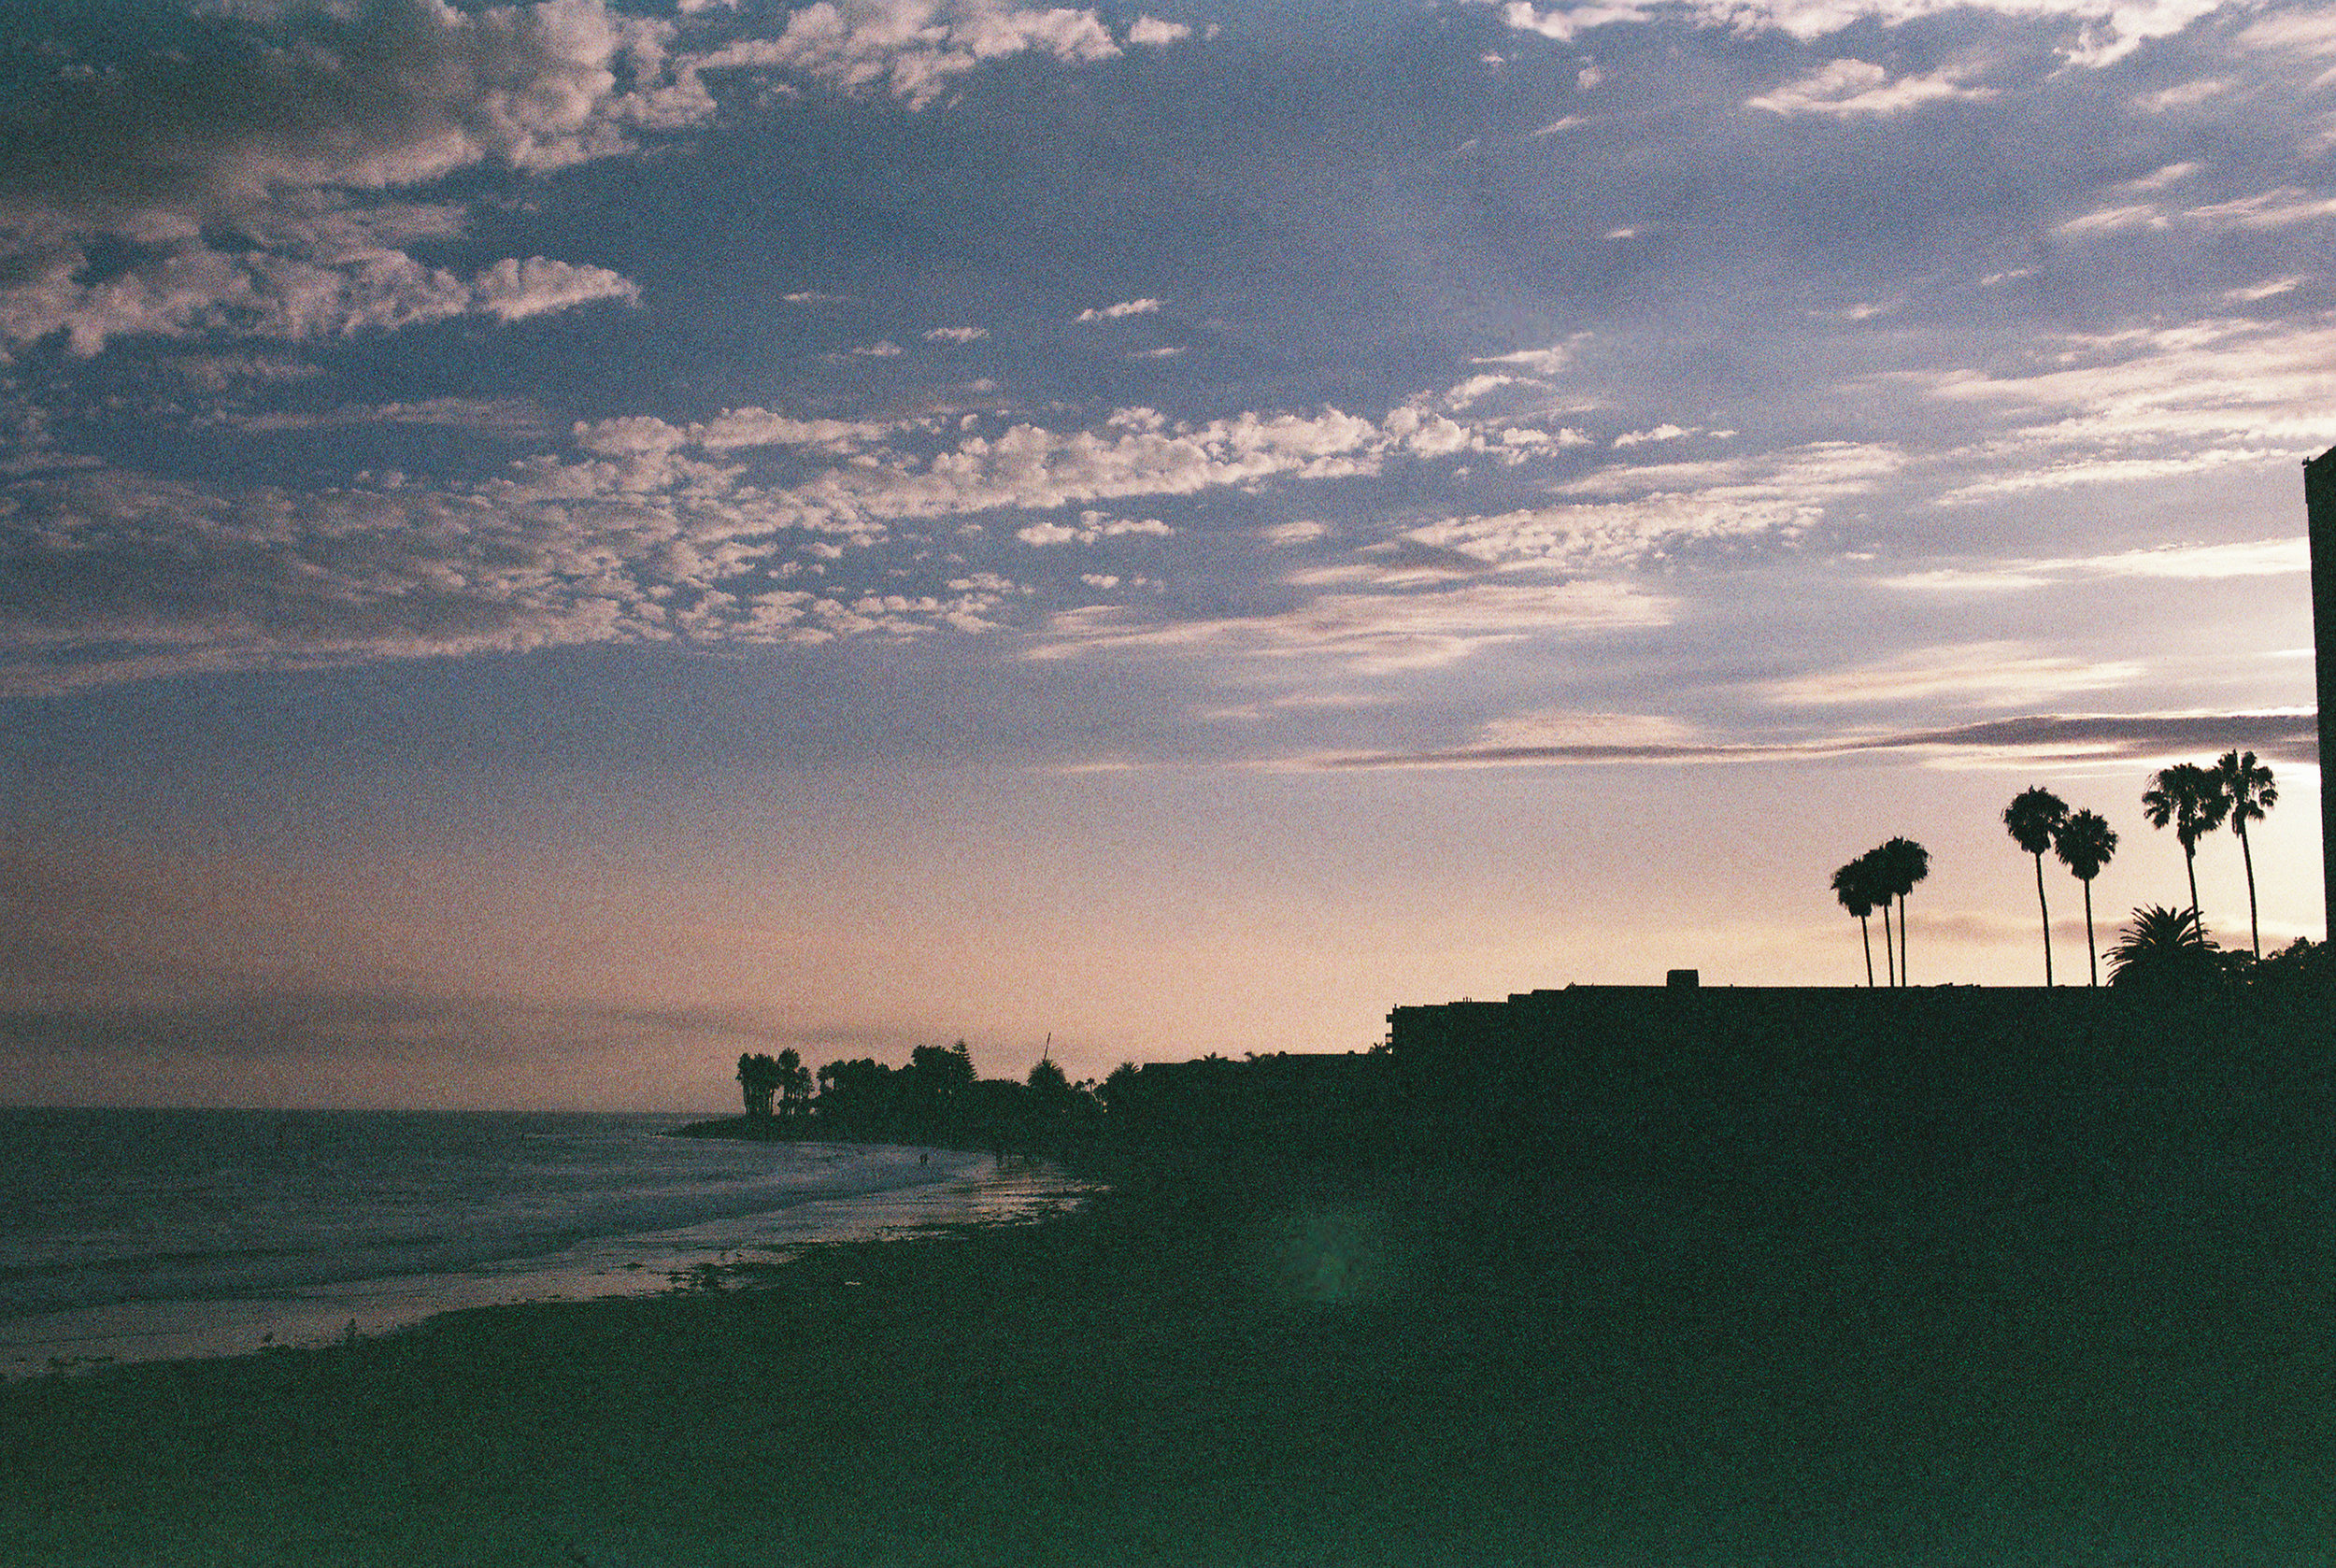 35mm Film-0018.jpg